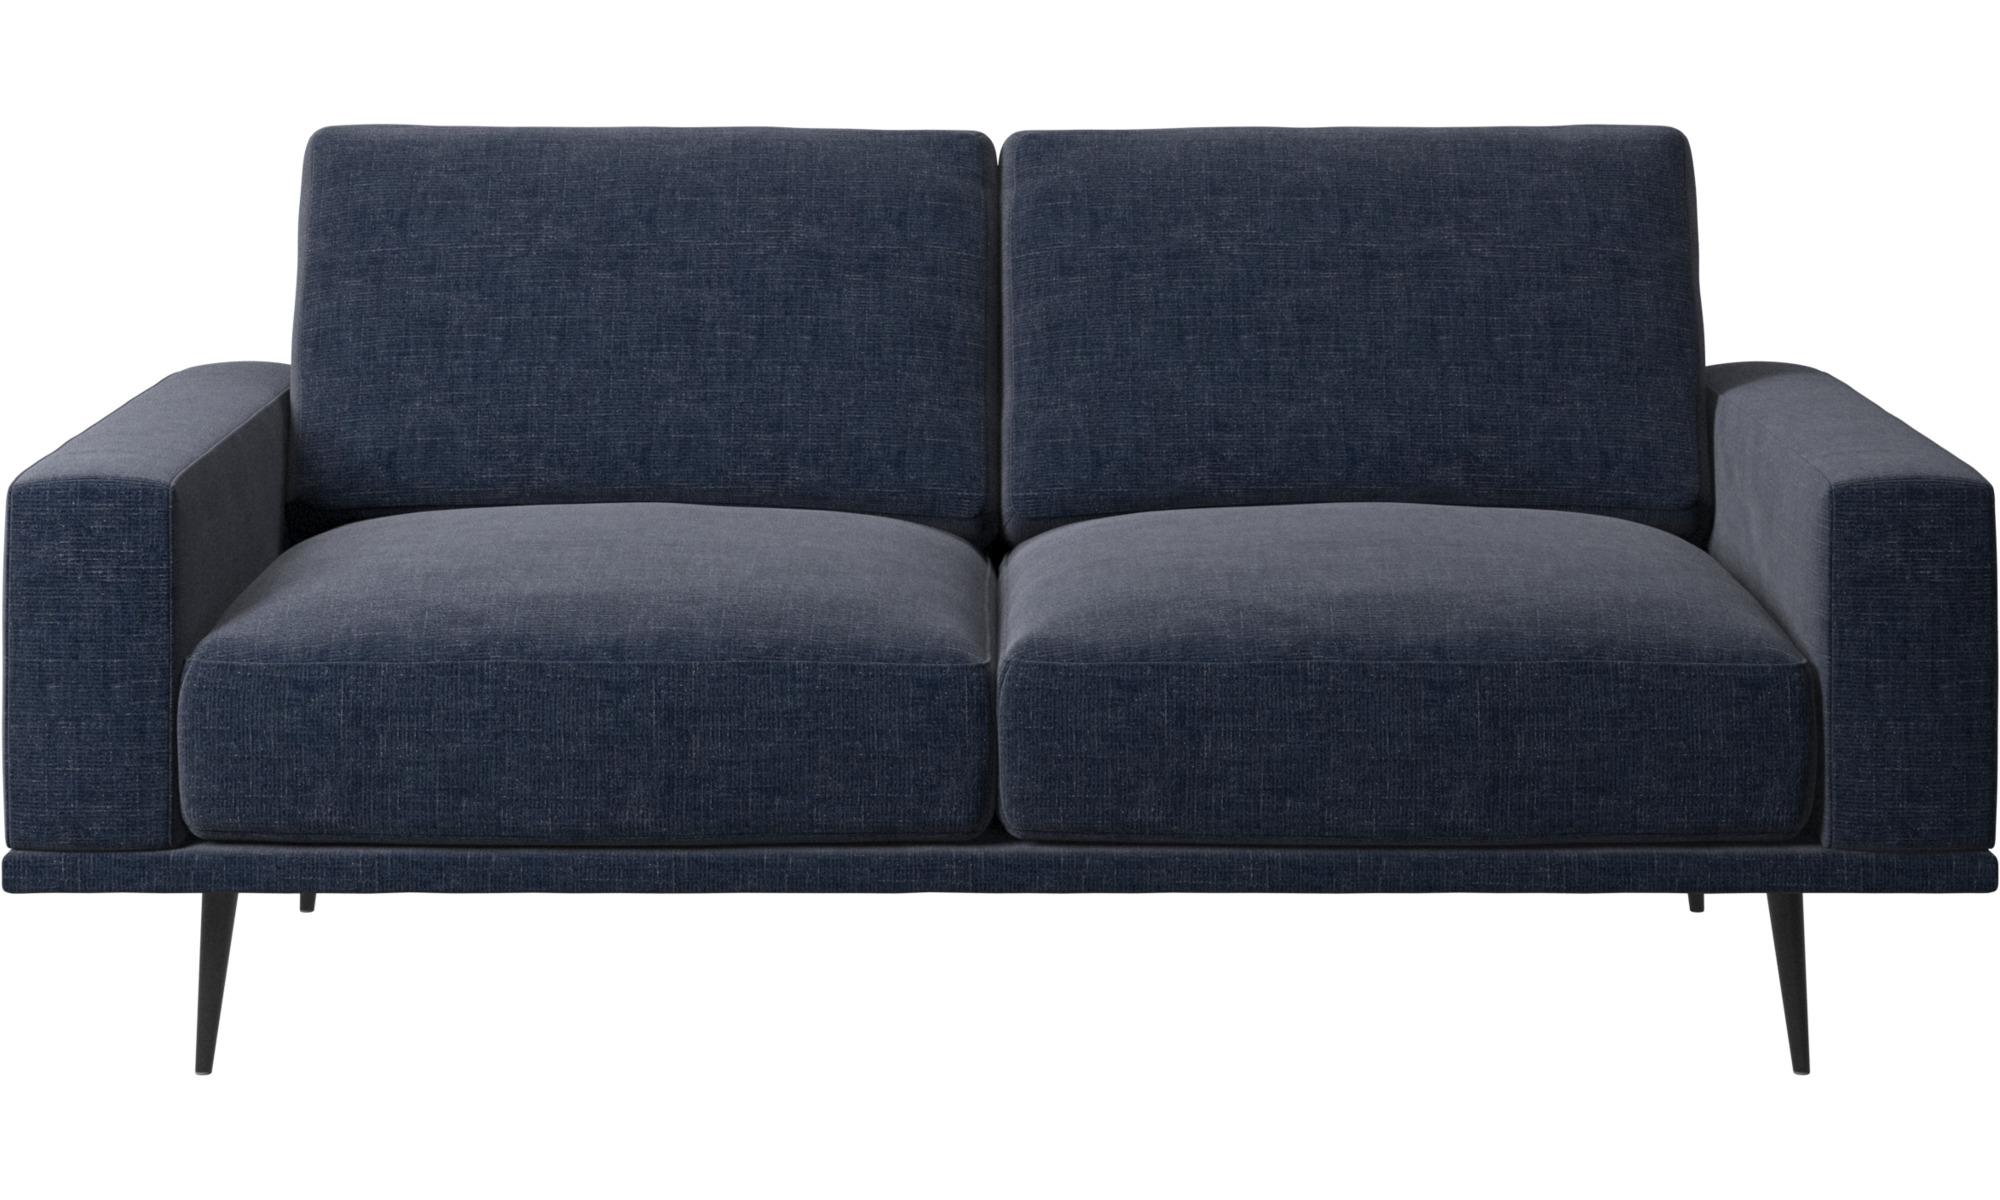 2 sitzer sofas carlton sofa boconcept. Black Bedroom Furniture Sets. Home Design Ideas